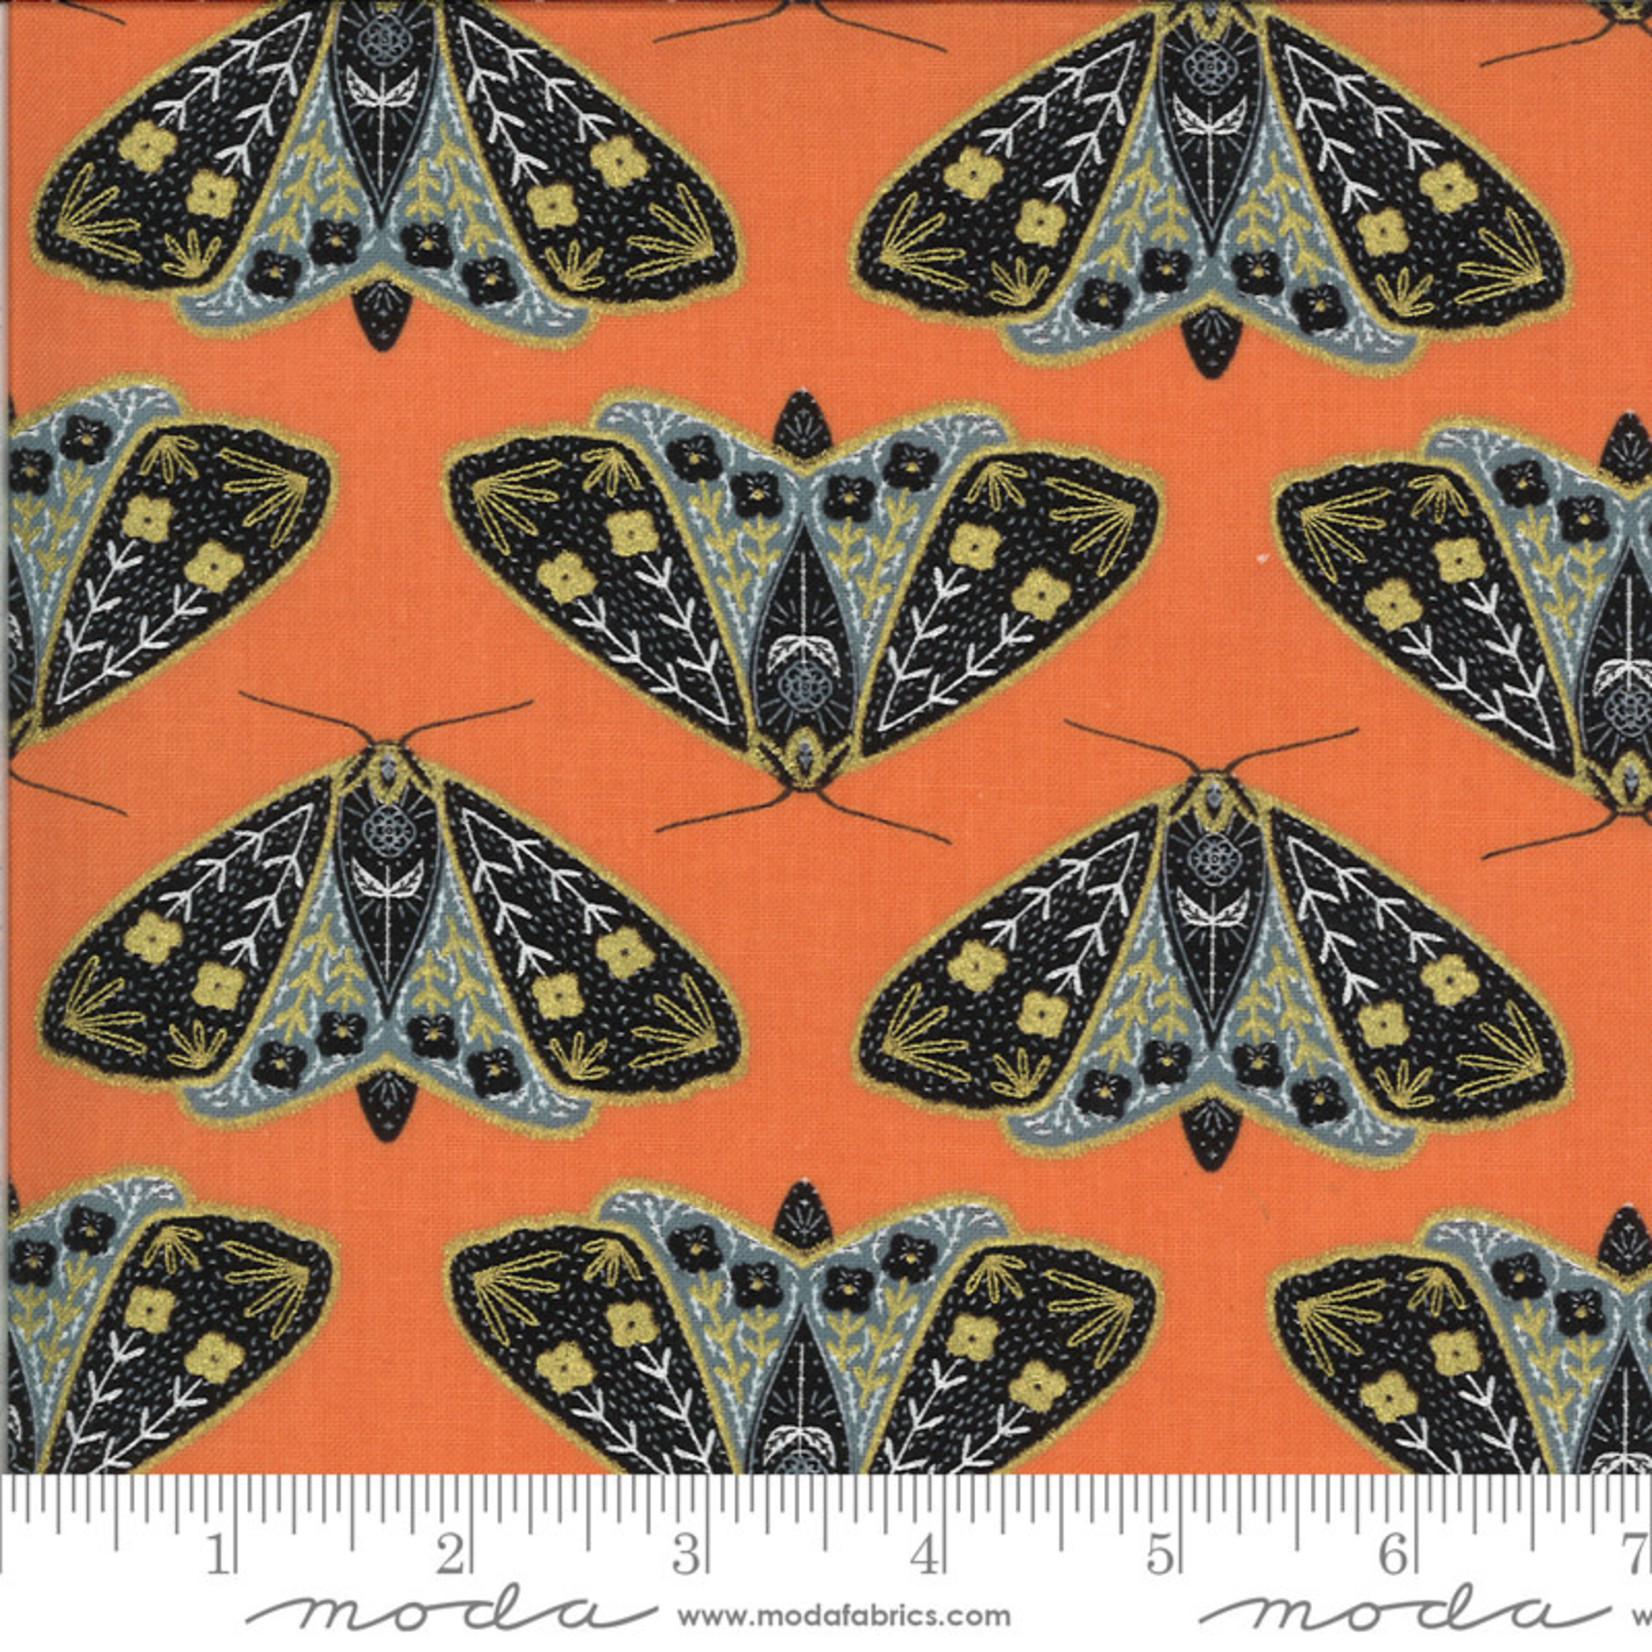 Gingiber Dwell In Possibility, Dainty Moth, Poppy 48311 11M $0.21/cm or $21/m